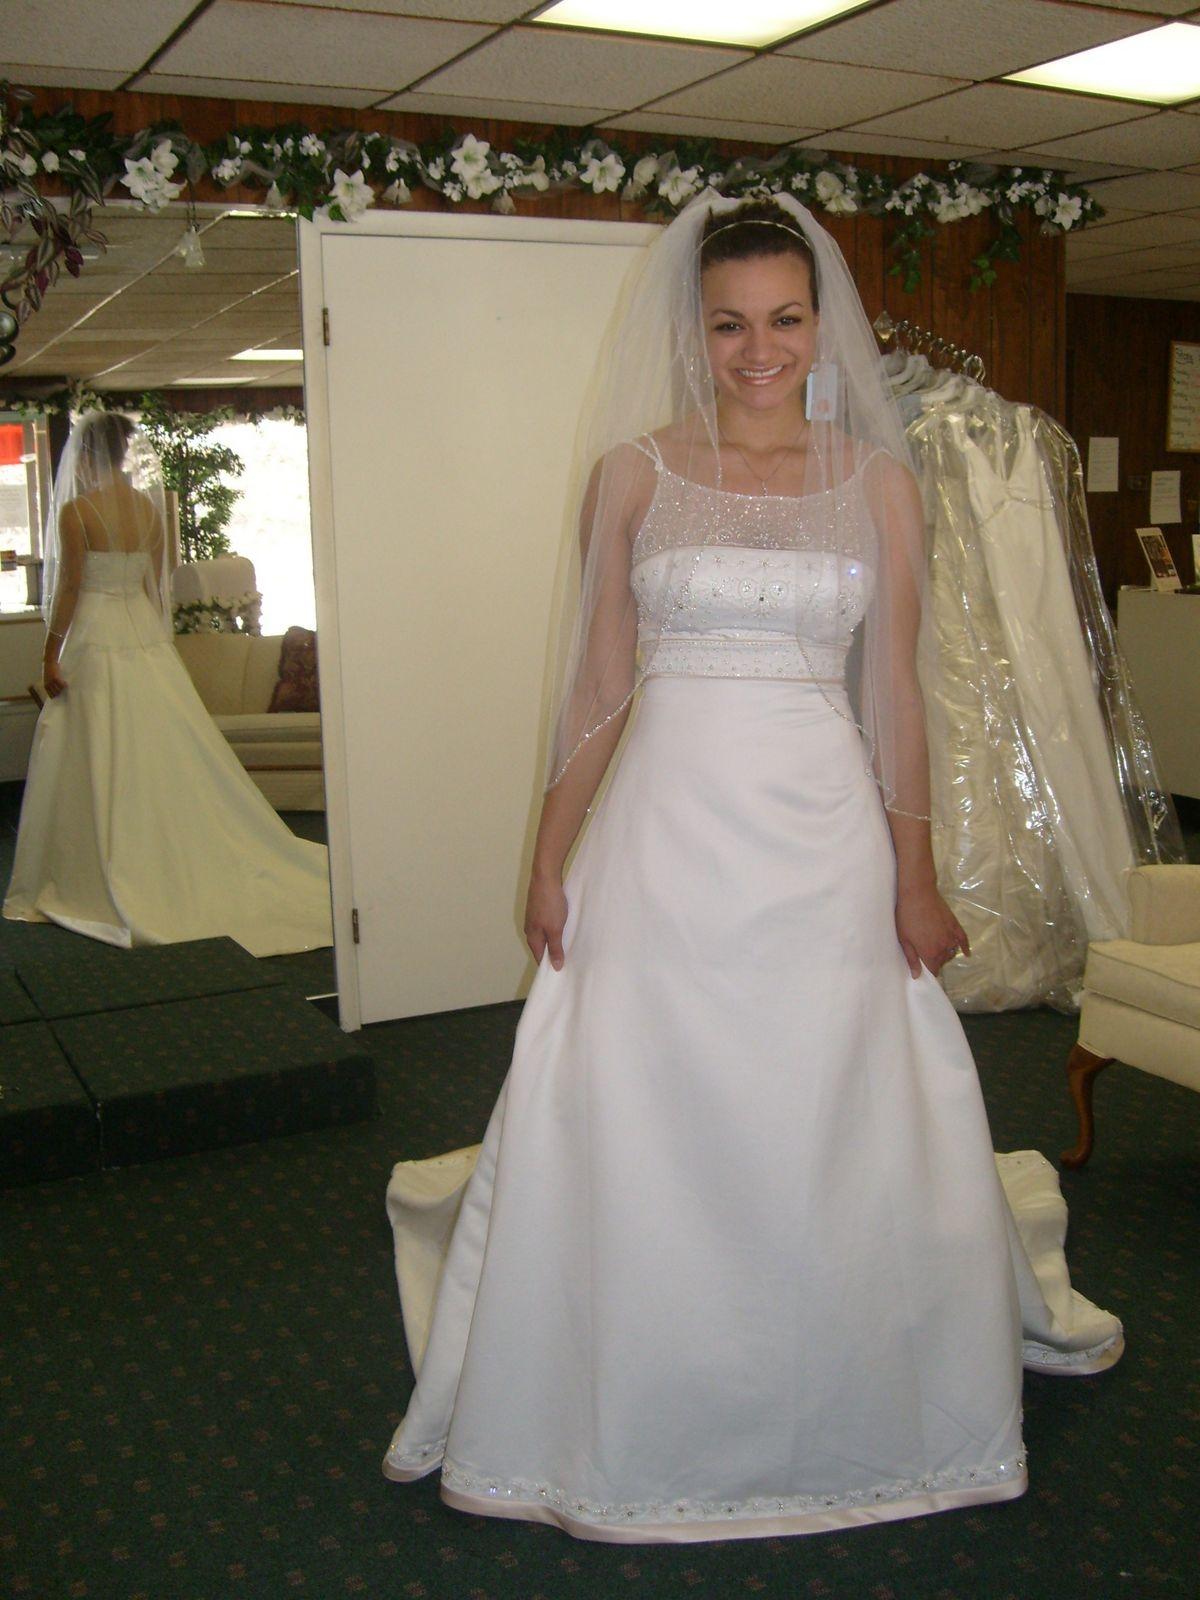 dress to wear to a wedding as